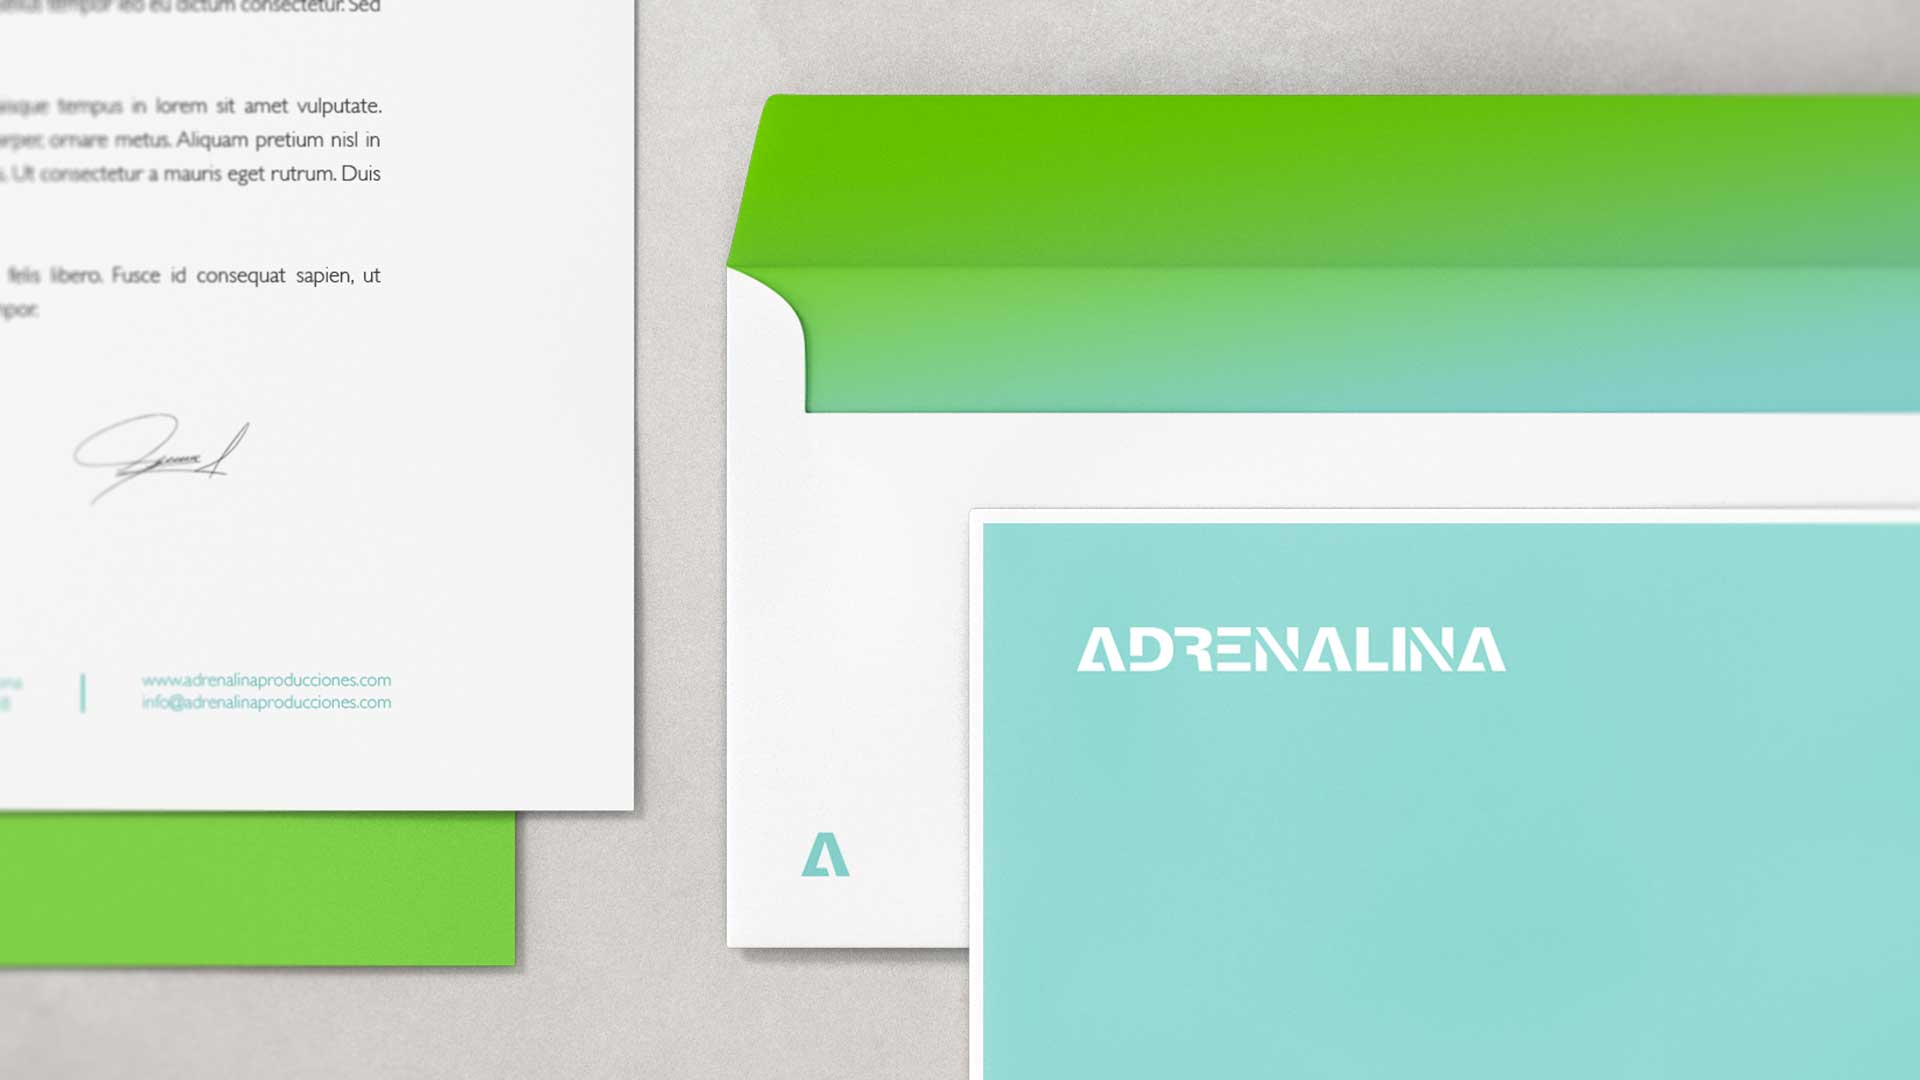 adrenalina_branding_identity_3a